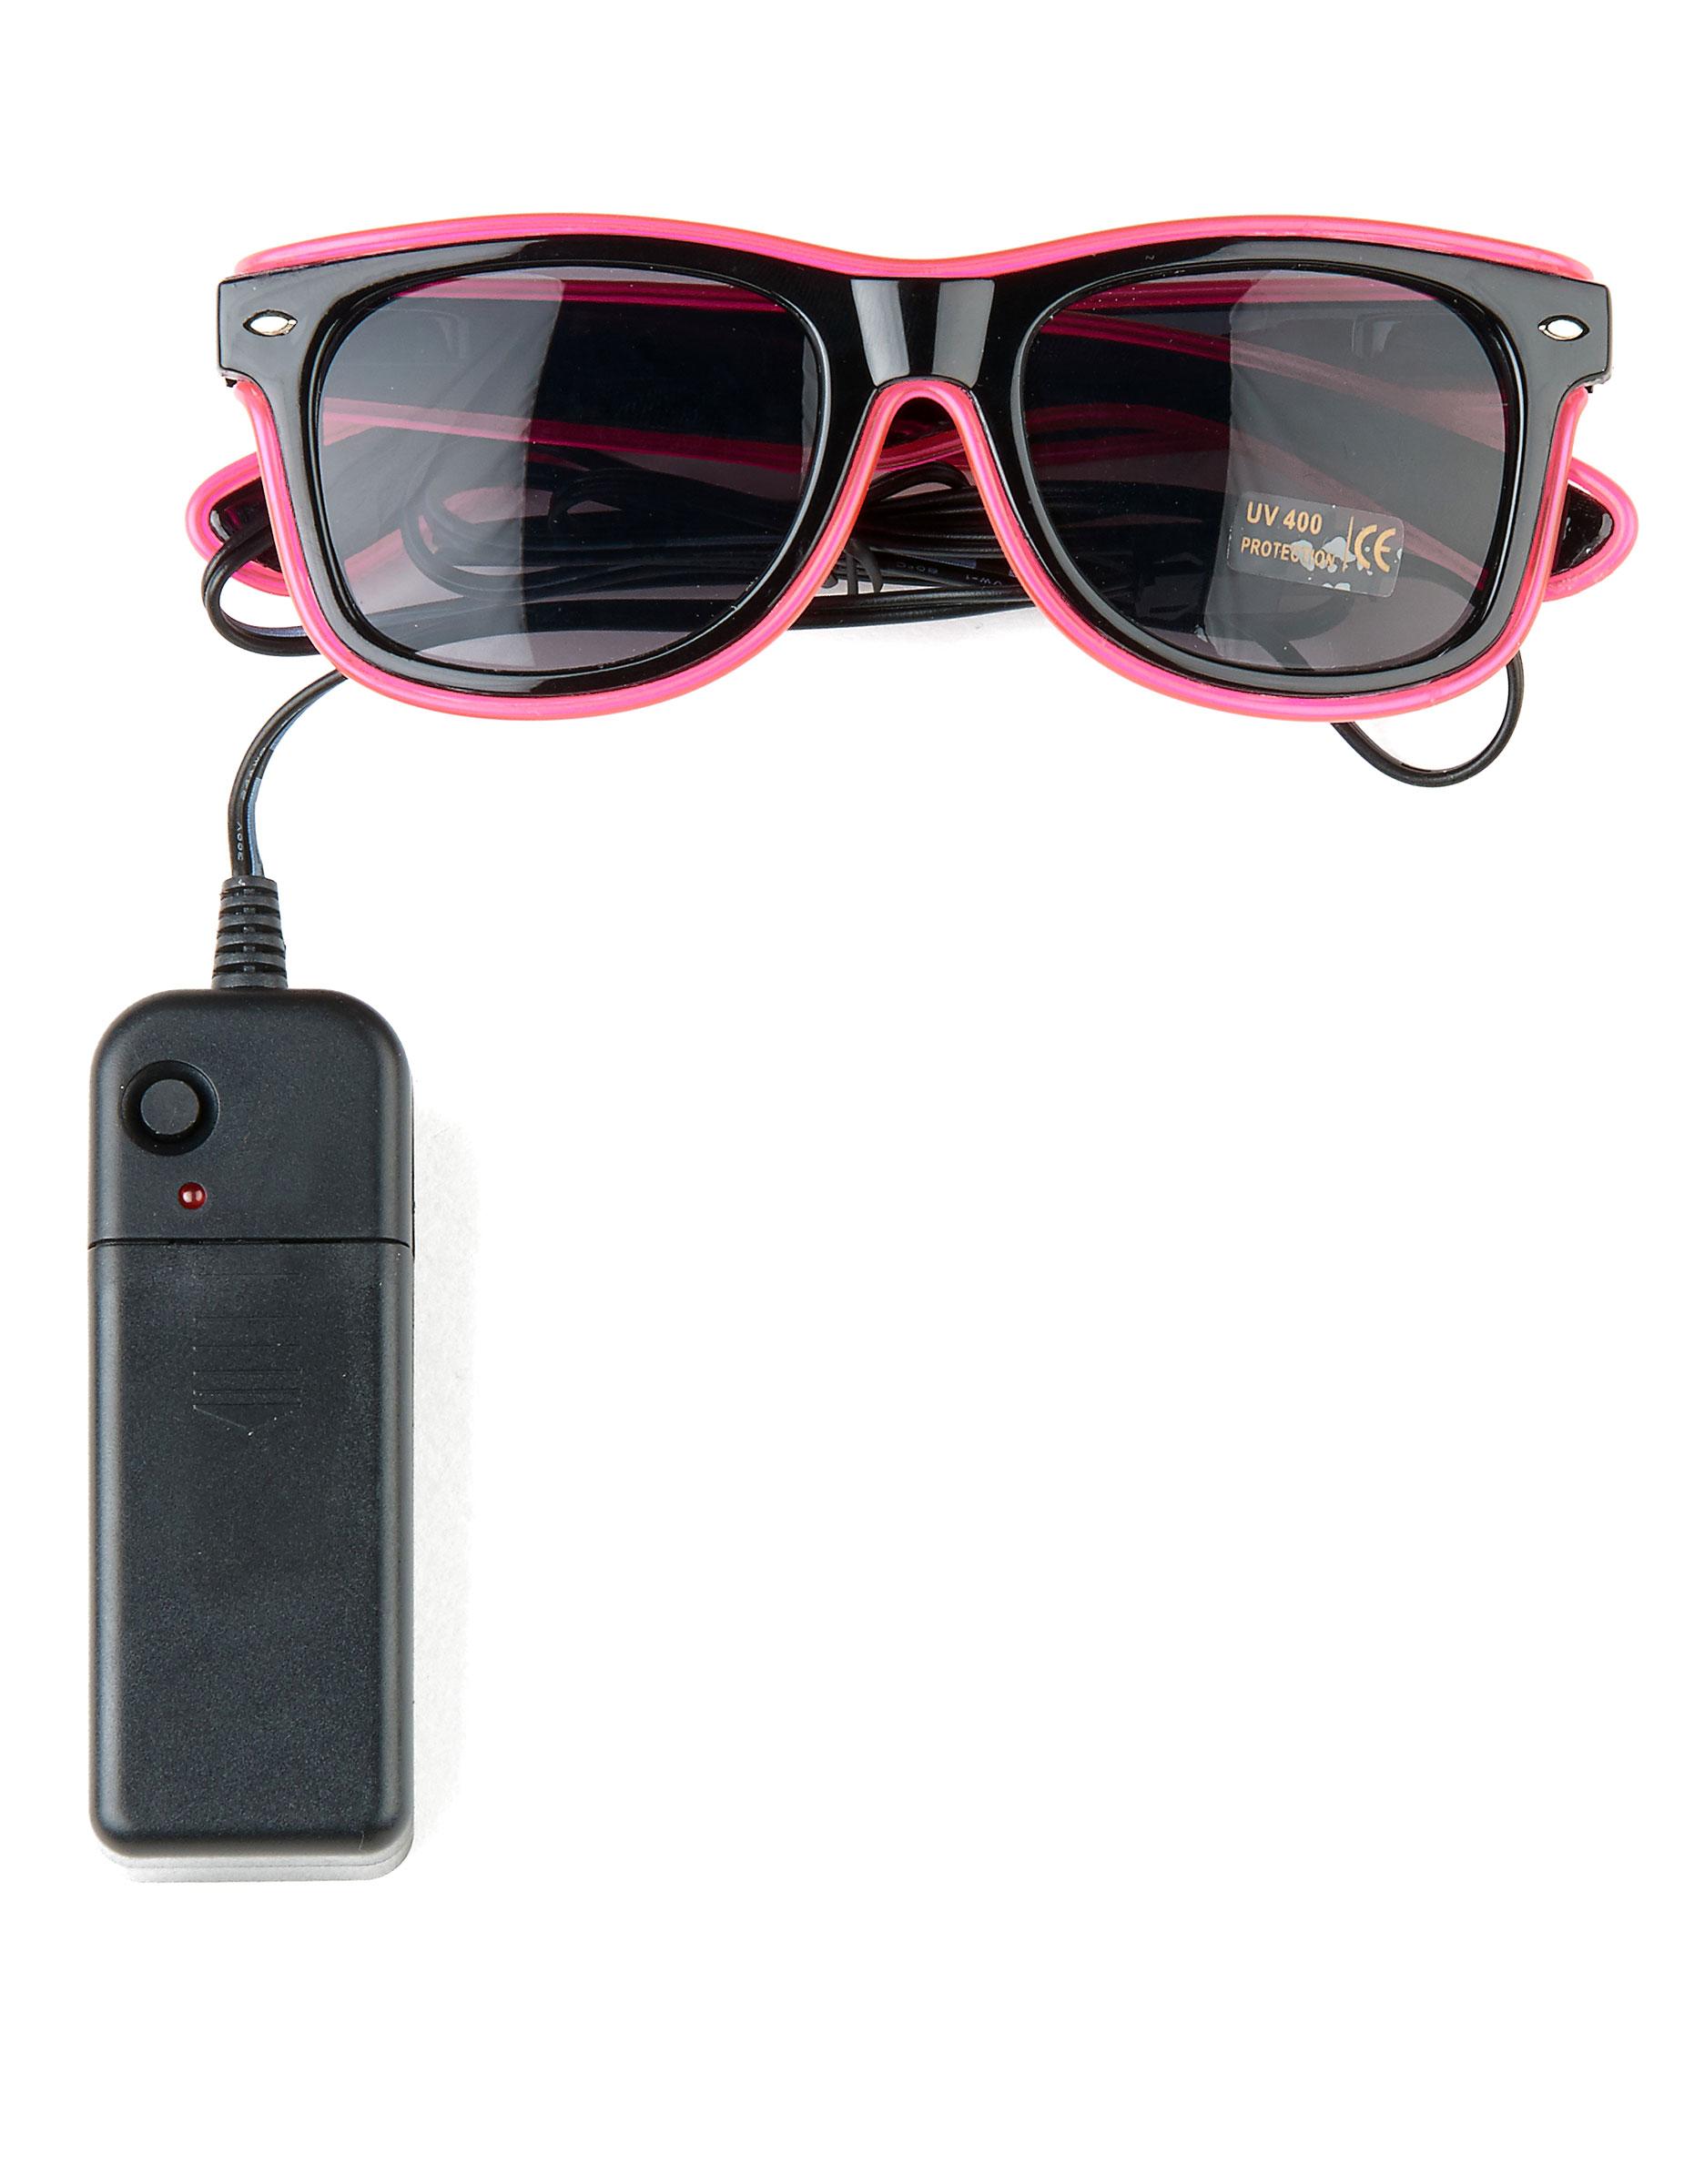 Óculos anos 50  luminosos cor-de-rosa adulto  Acessórios,mascarilhas e  fatos de carnaval - Vegaoo 4ef0c3e34d